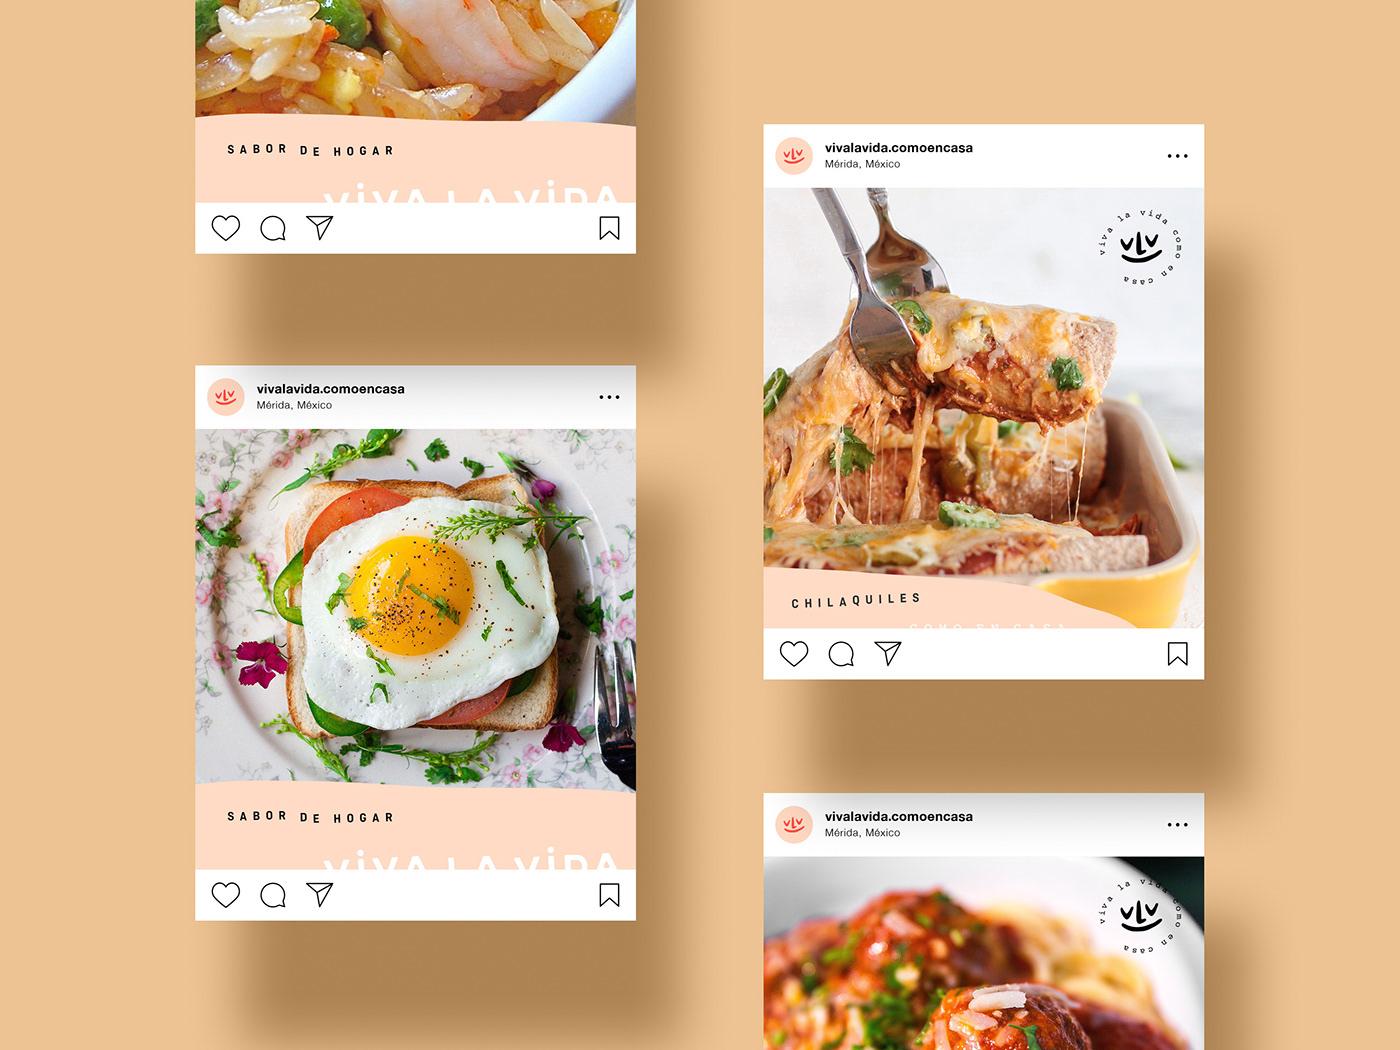 vegrande restaurant mérida mexico branding  identity design homemade Food  Packaging